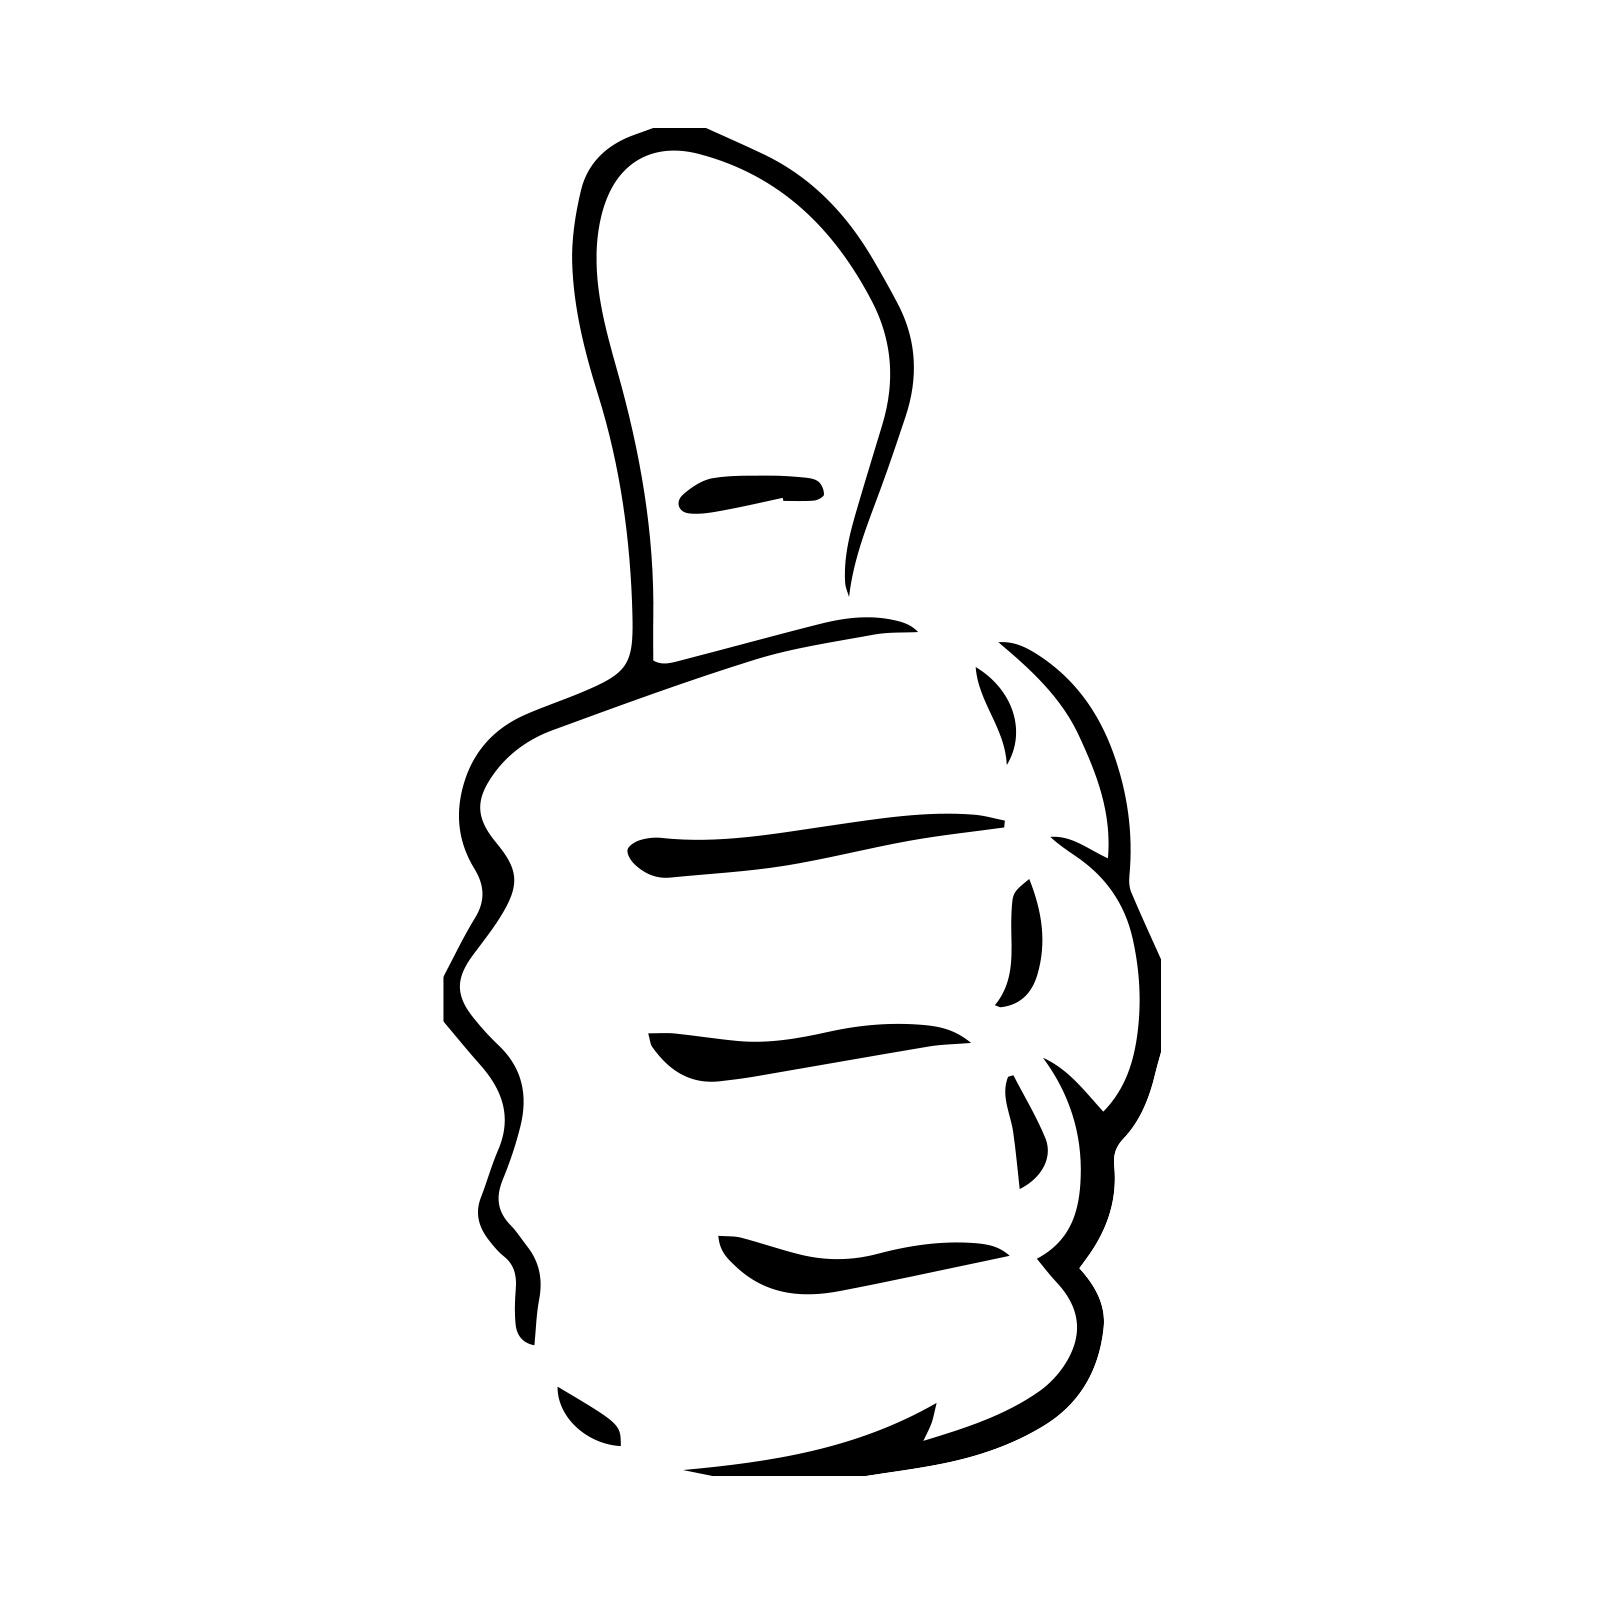 Thumbs Up Hand Symbol Snowboard Sticker All Weather Vinyl